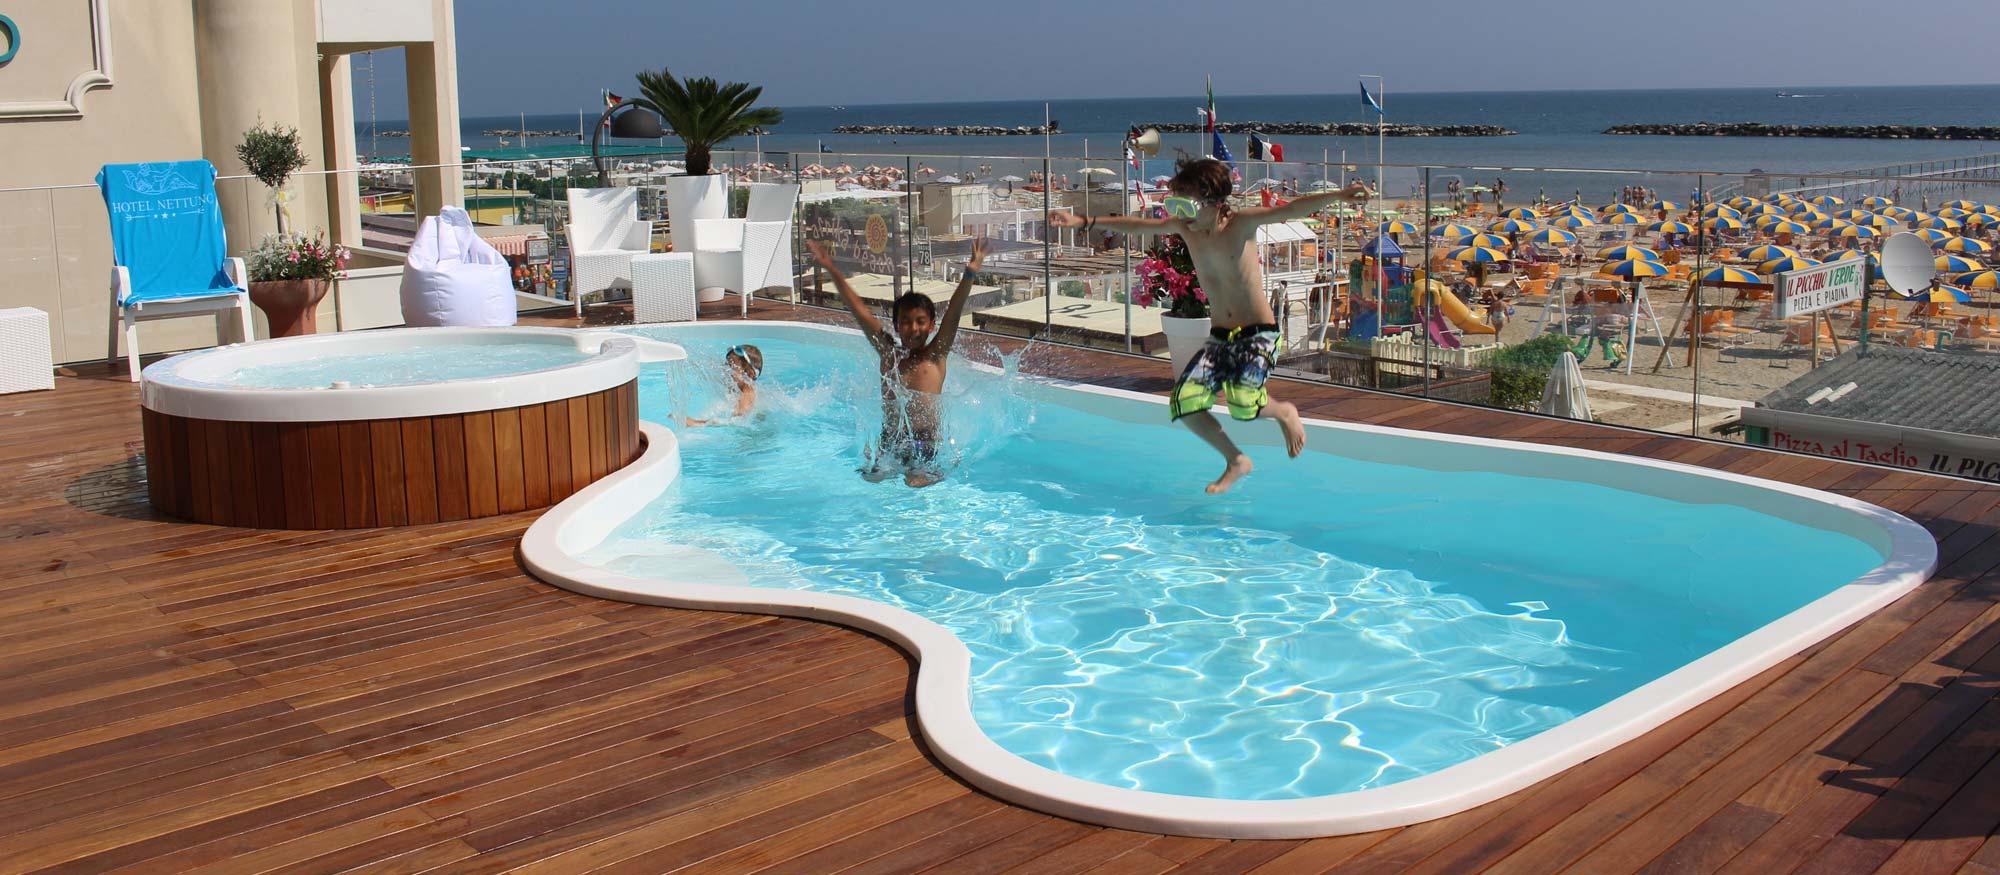 Hotel con piscina a bellaria igea marina hotel nettuno igea - Hotel con piscina bellaria ...